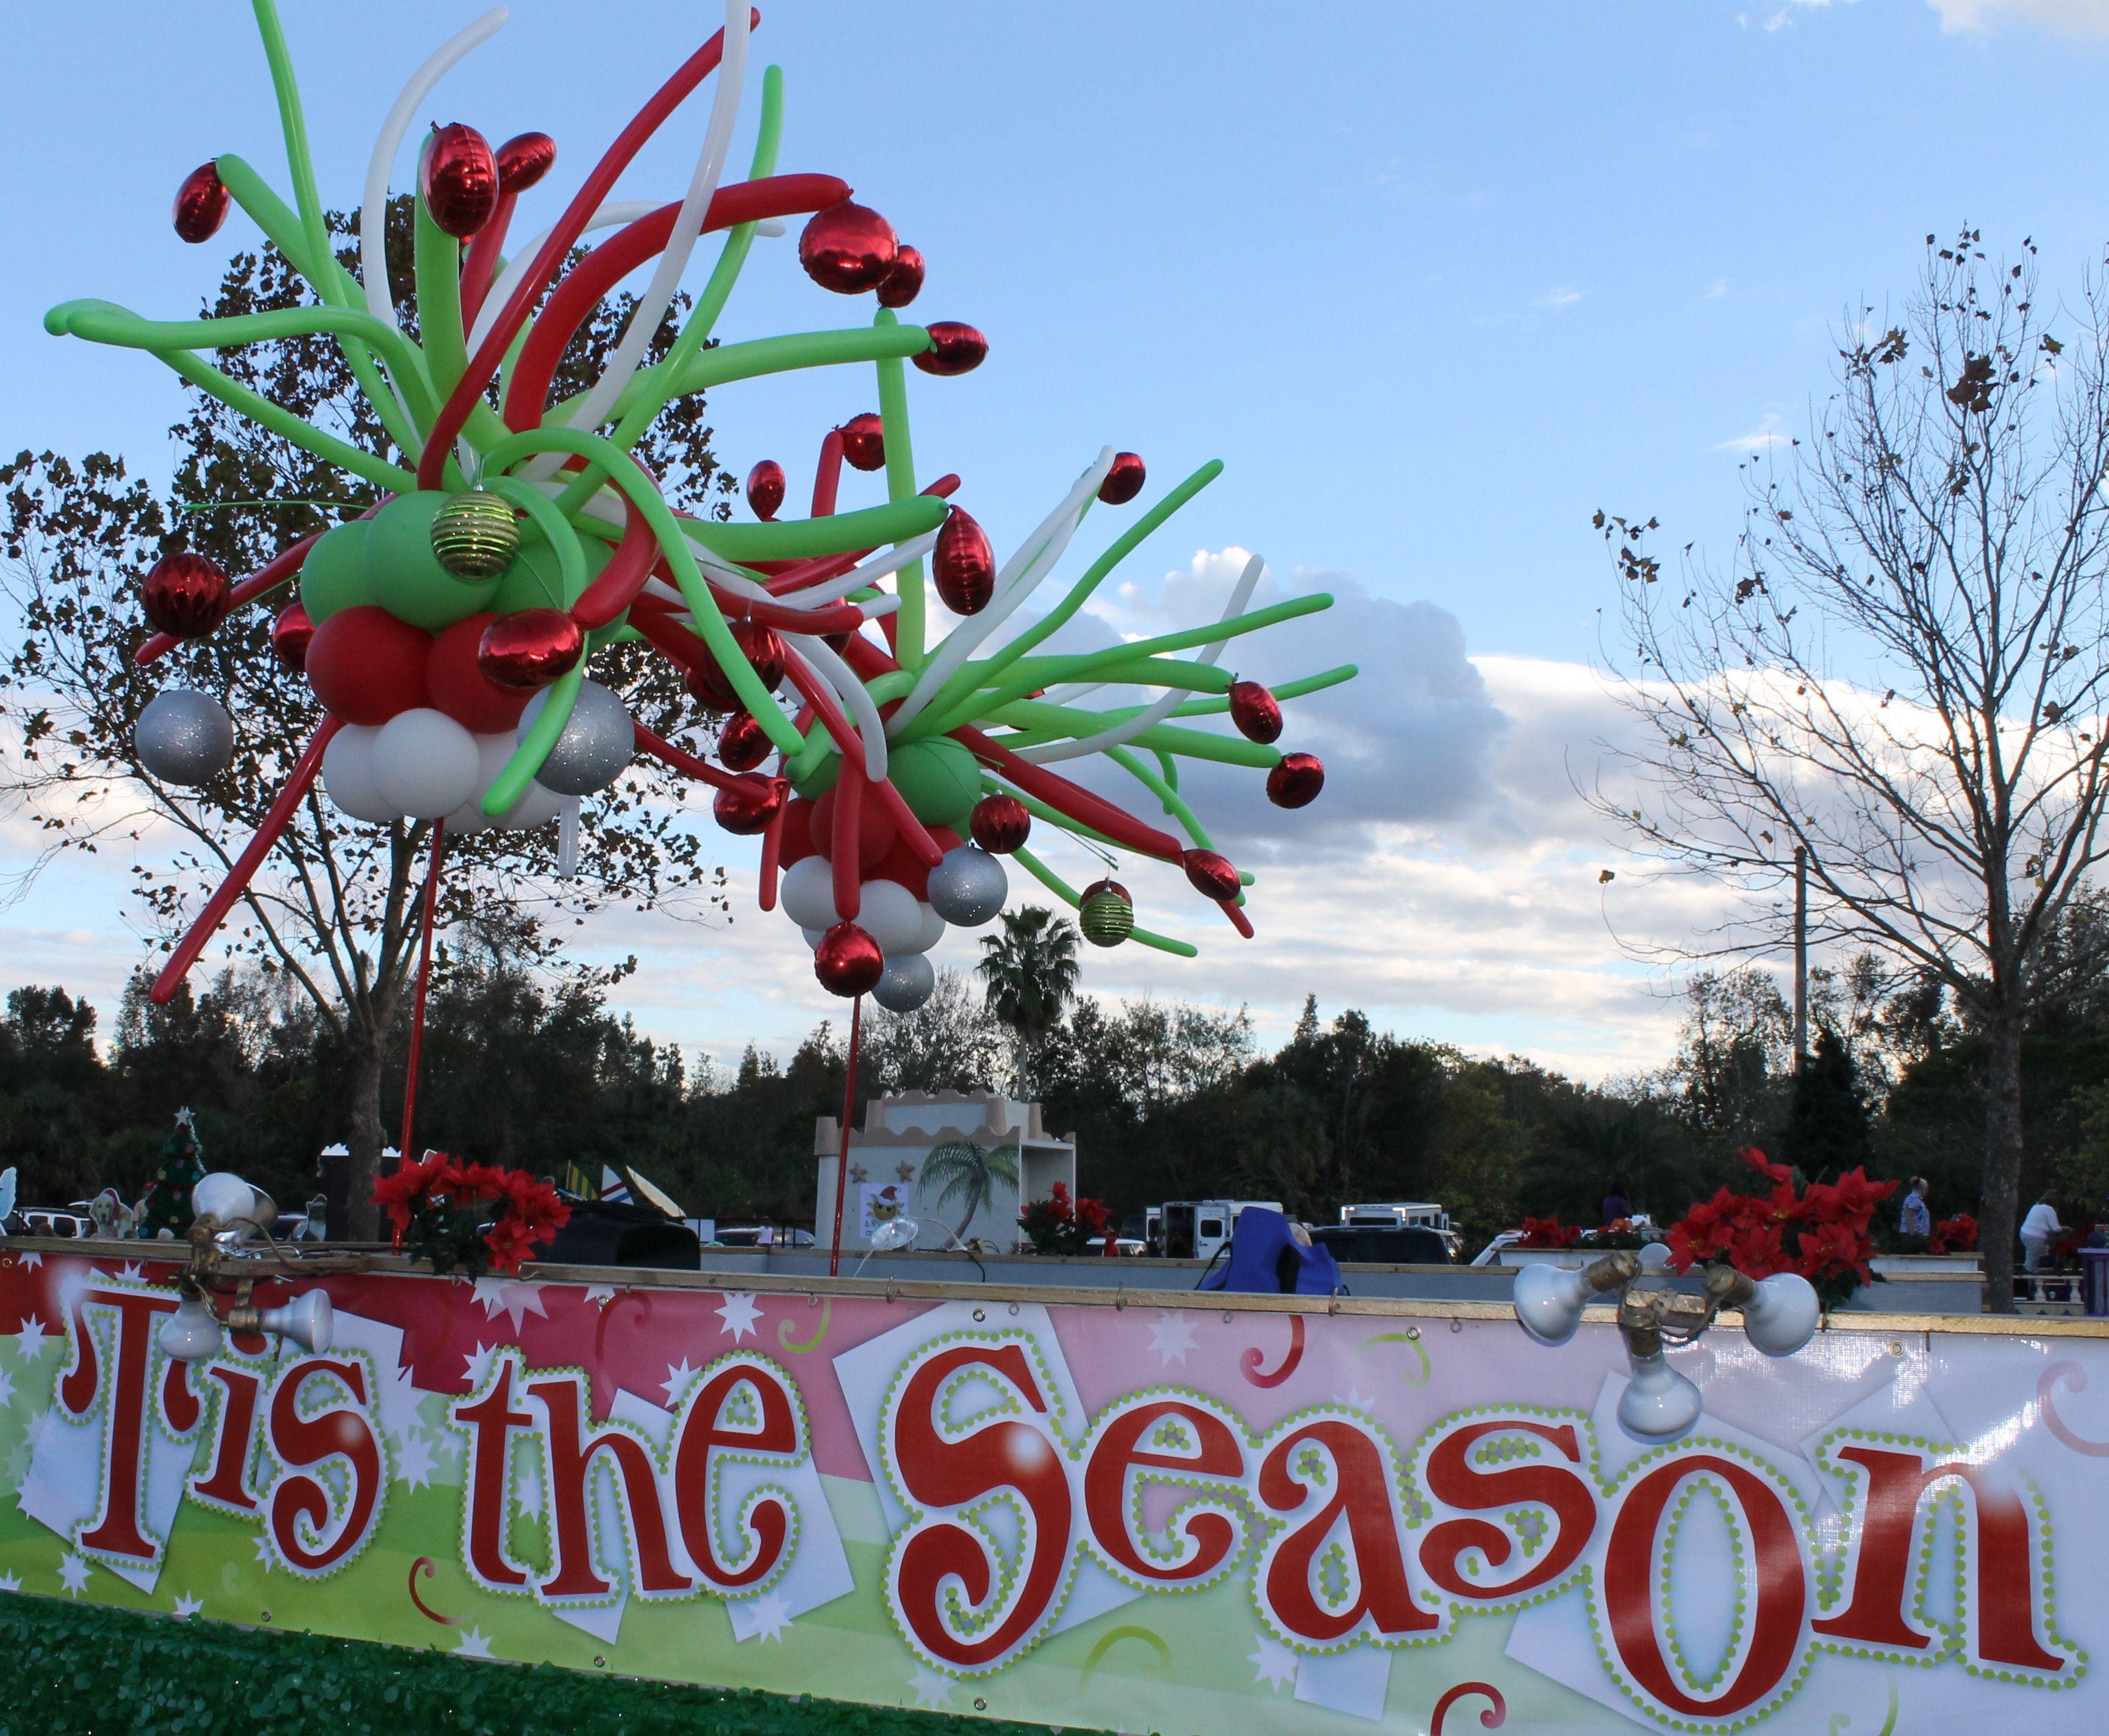 Christmas festival ideas for church - Christmas Parade Floats Allen Company Christmas Parade Float Lakeland Florida 2012